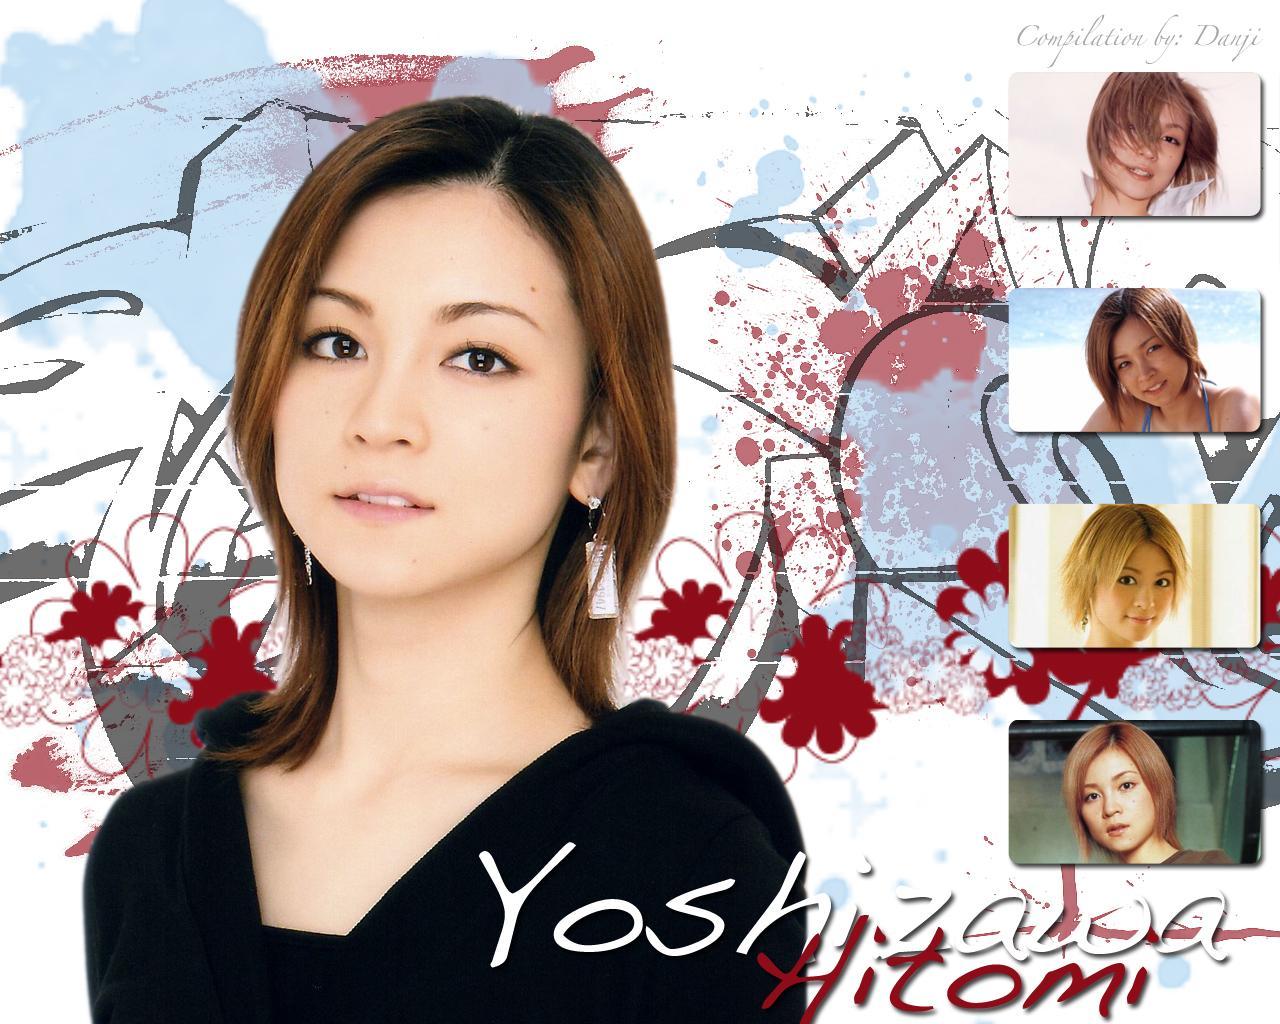 Yossie-dtop-001